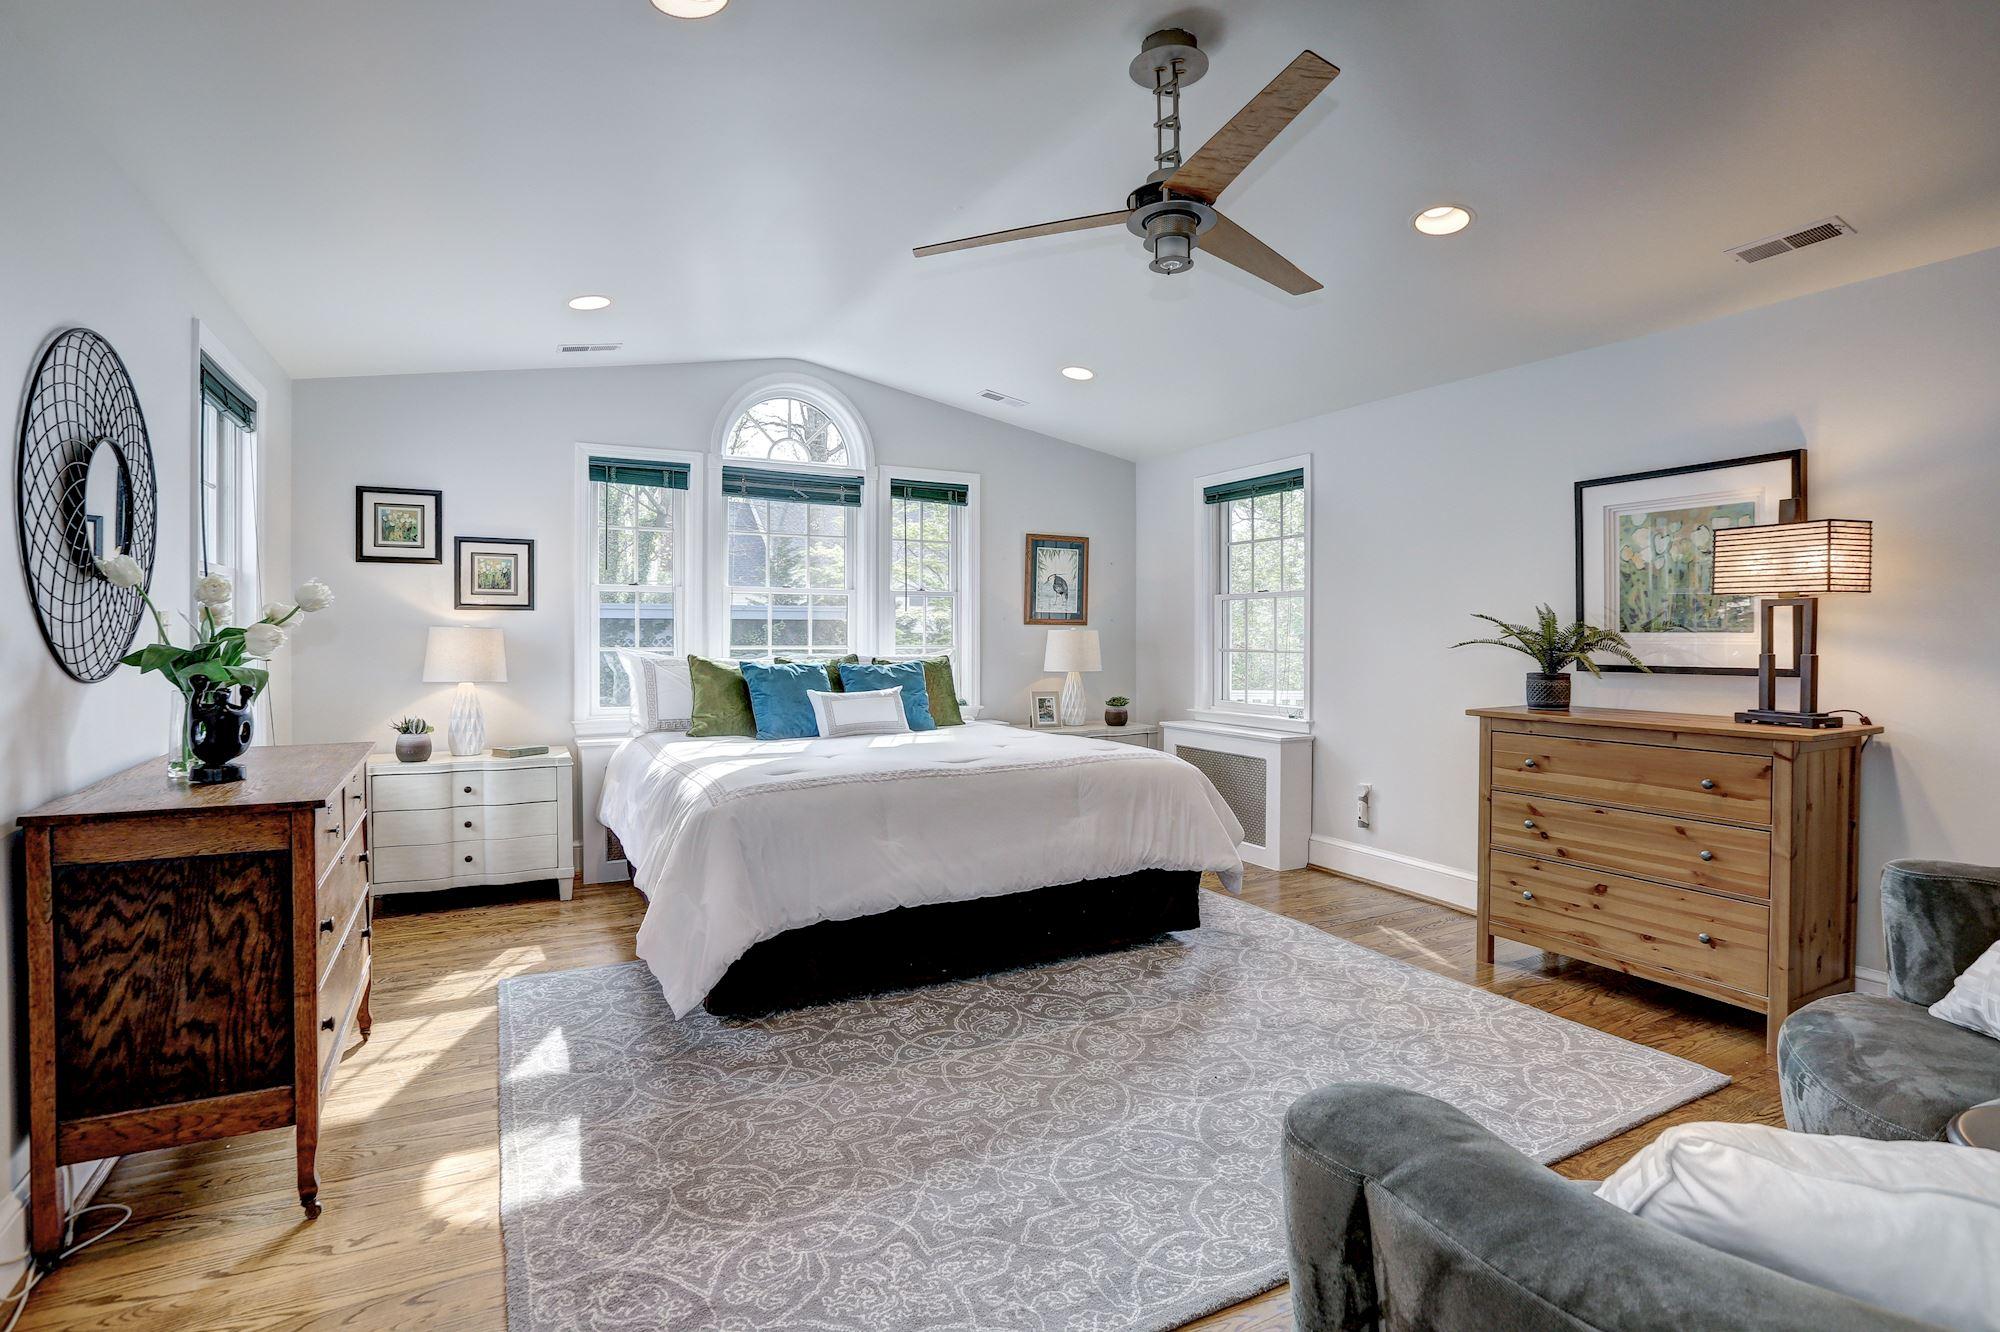 9007 Mohawk Lane,Bethesda,Maryland 20817,3 Bedrooms Bedrooms,3 BathroomsBathrooms,Single Family Home,Mohawk Lane,1037